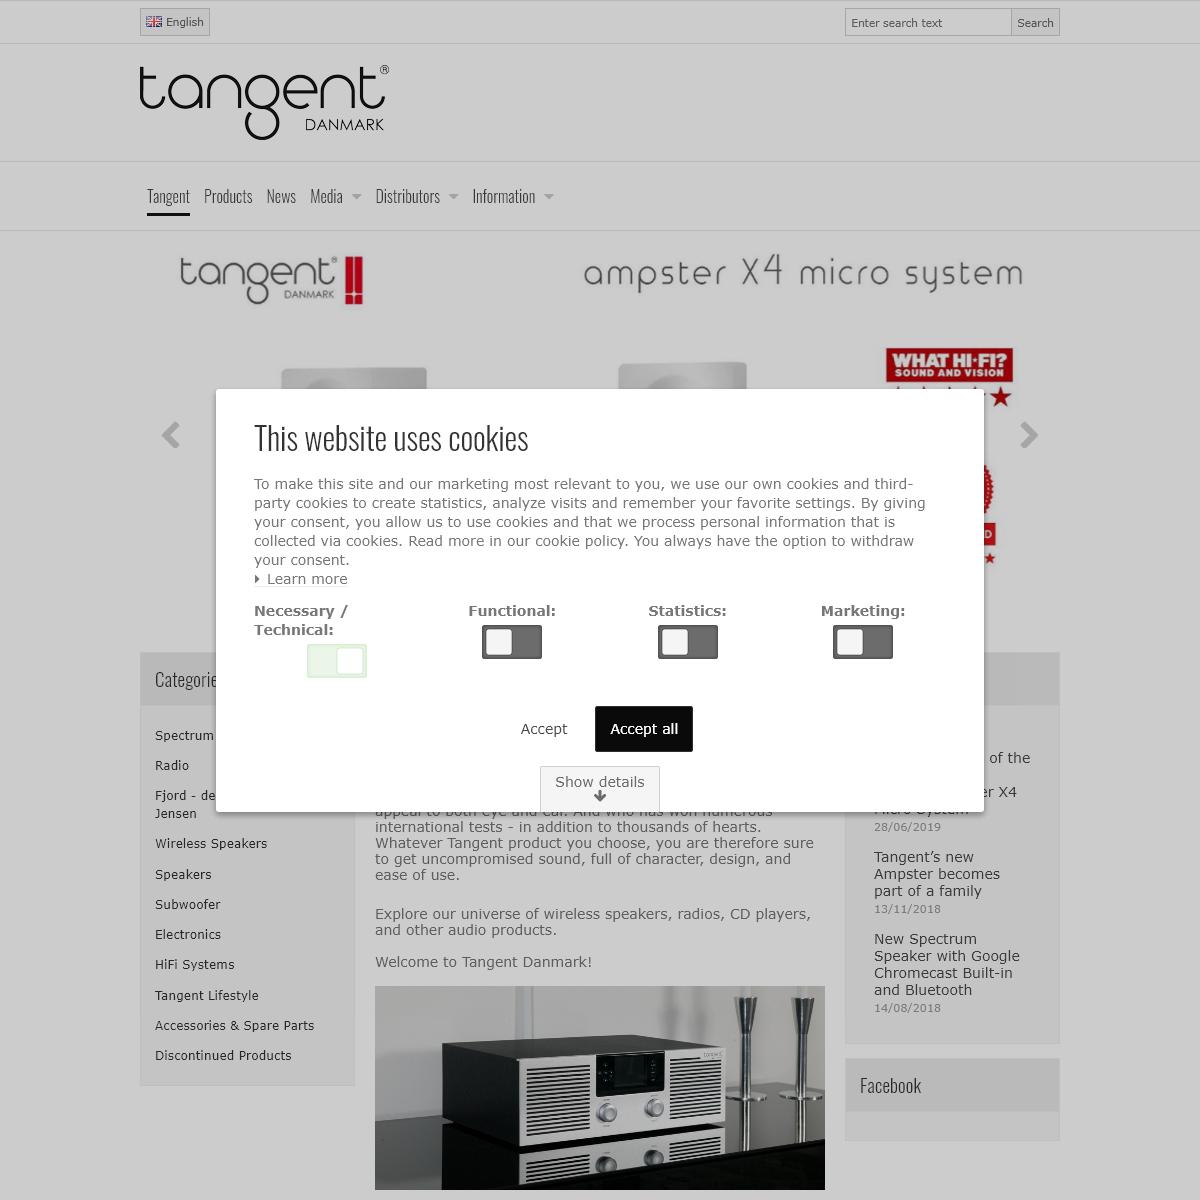 Tangent Danmark - Tangent A-S